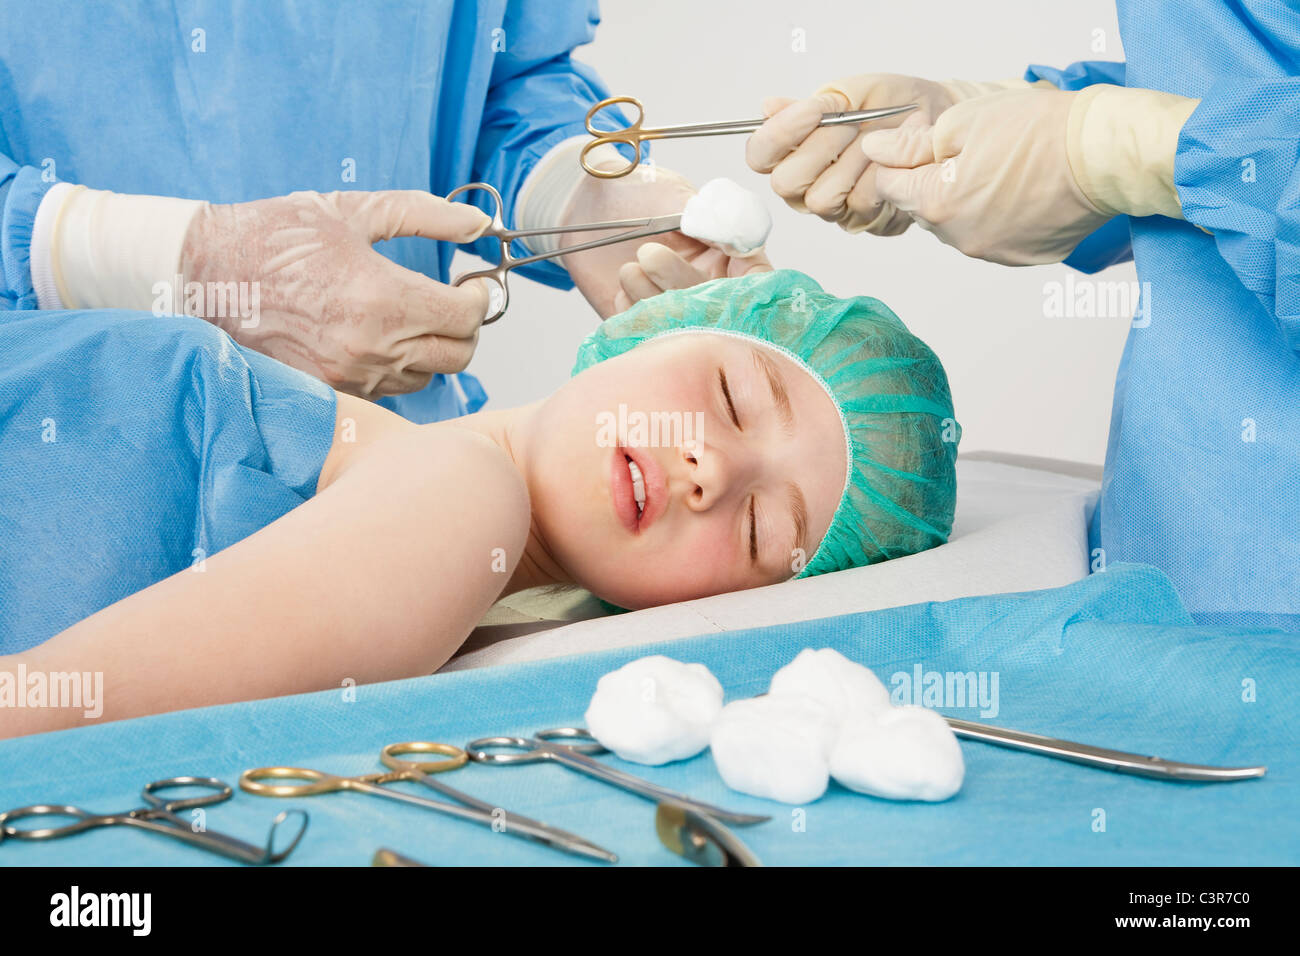 Germany, Munich, Surgeons performing operation - Stock Image